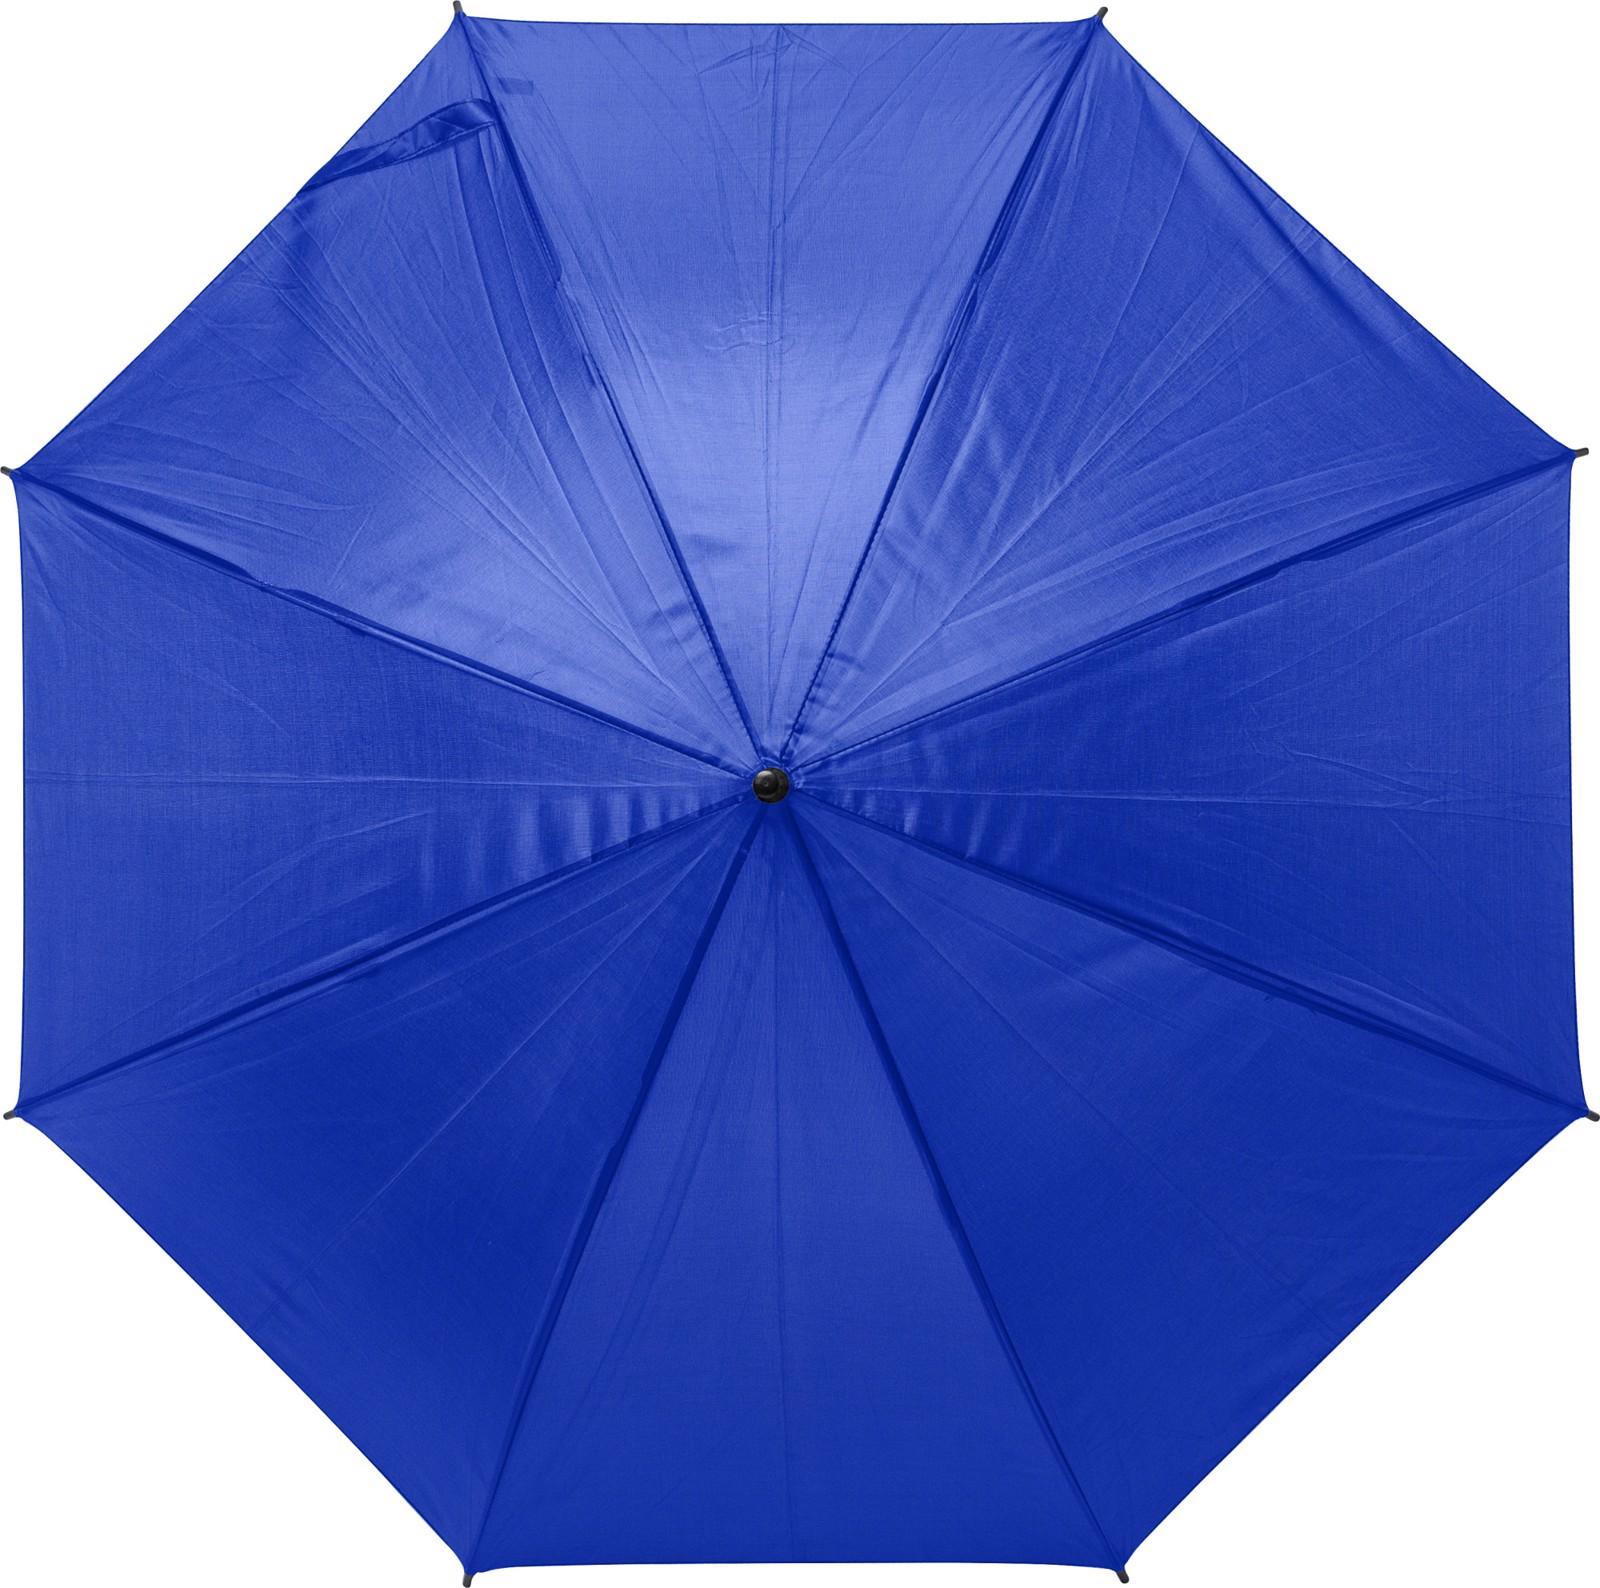 Polyester (170T) umbrella - Blue